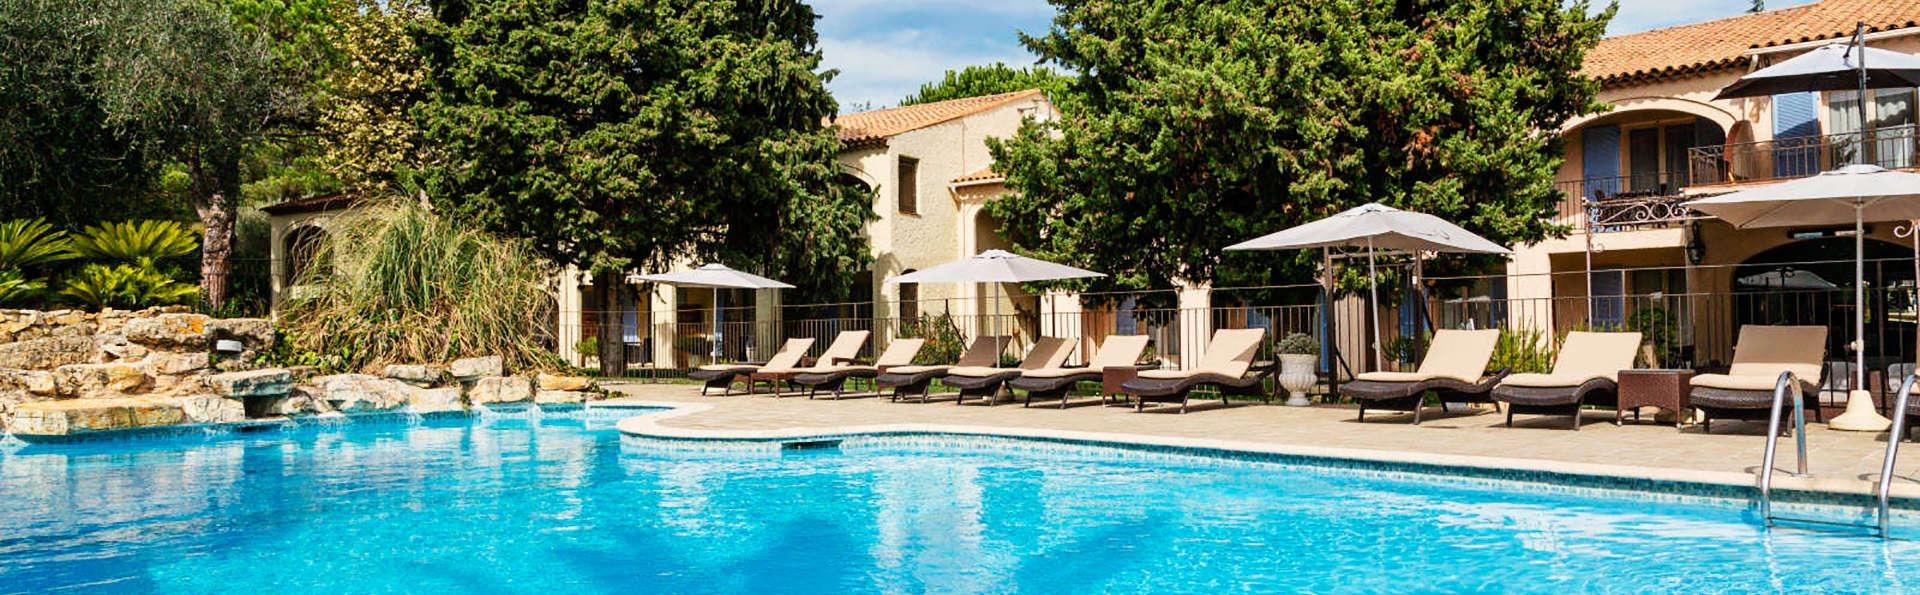 Hôtel Spa la Lune de Mougins - EDIT_pool3.jpg